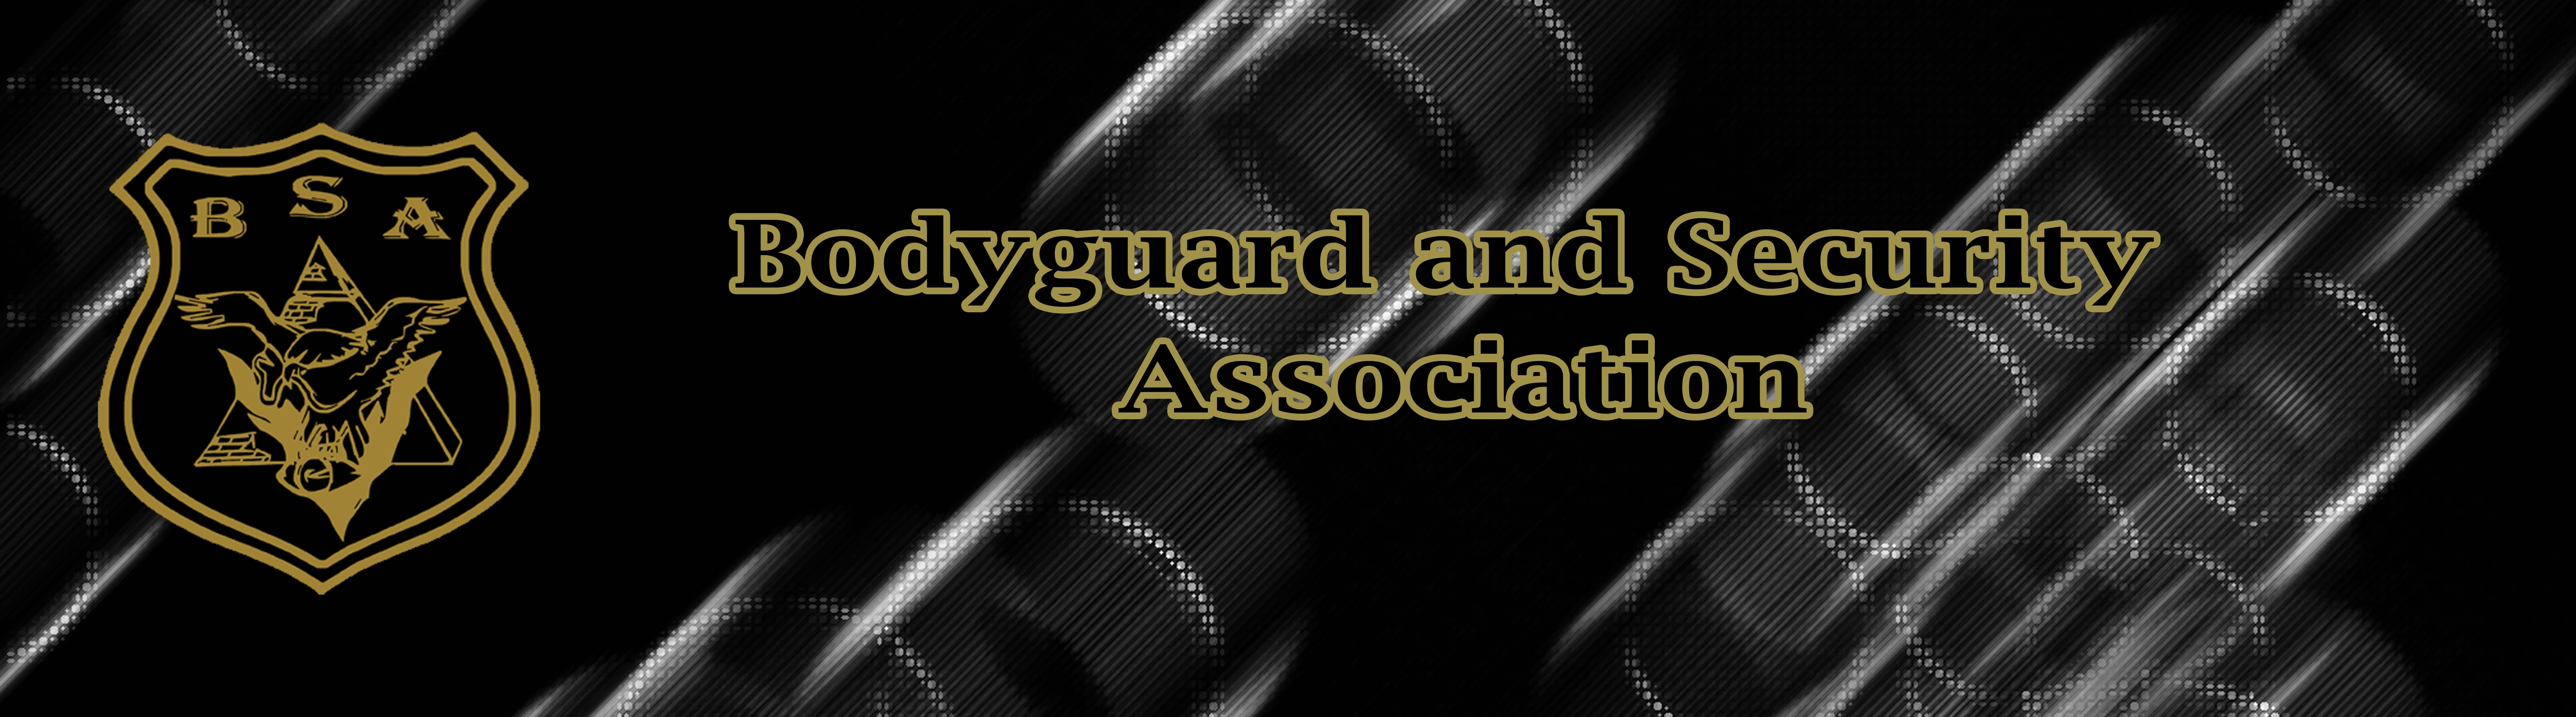 BSA Bodyguard & Security Association